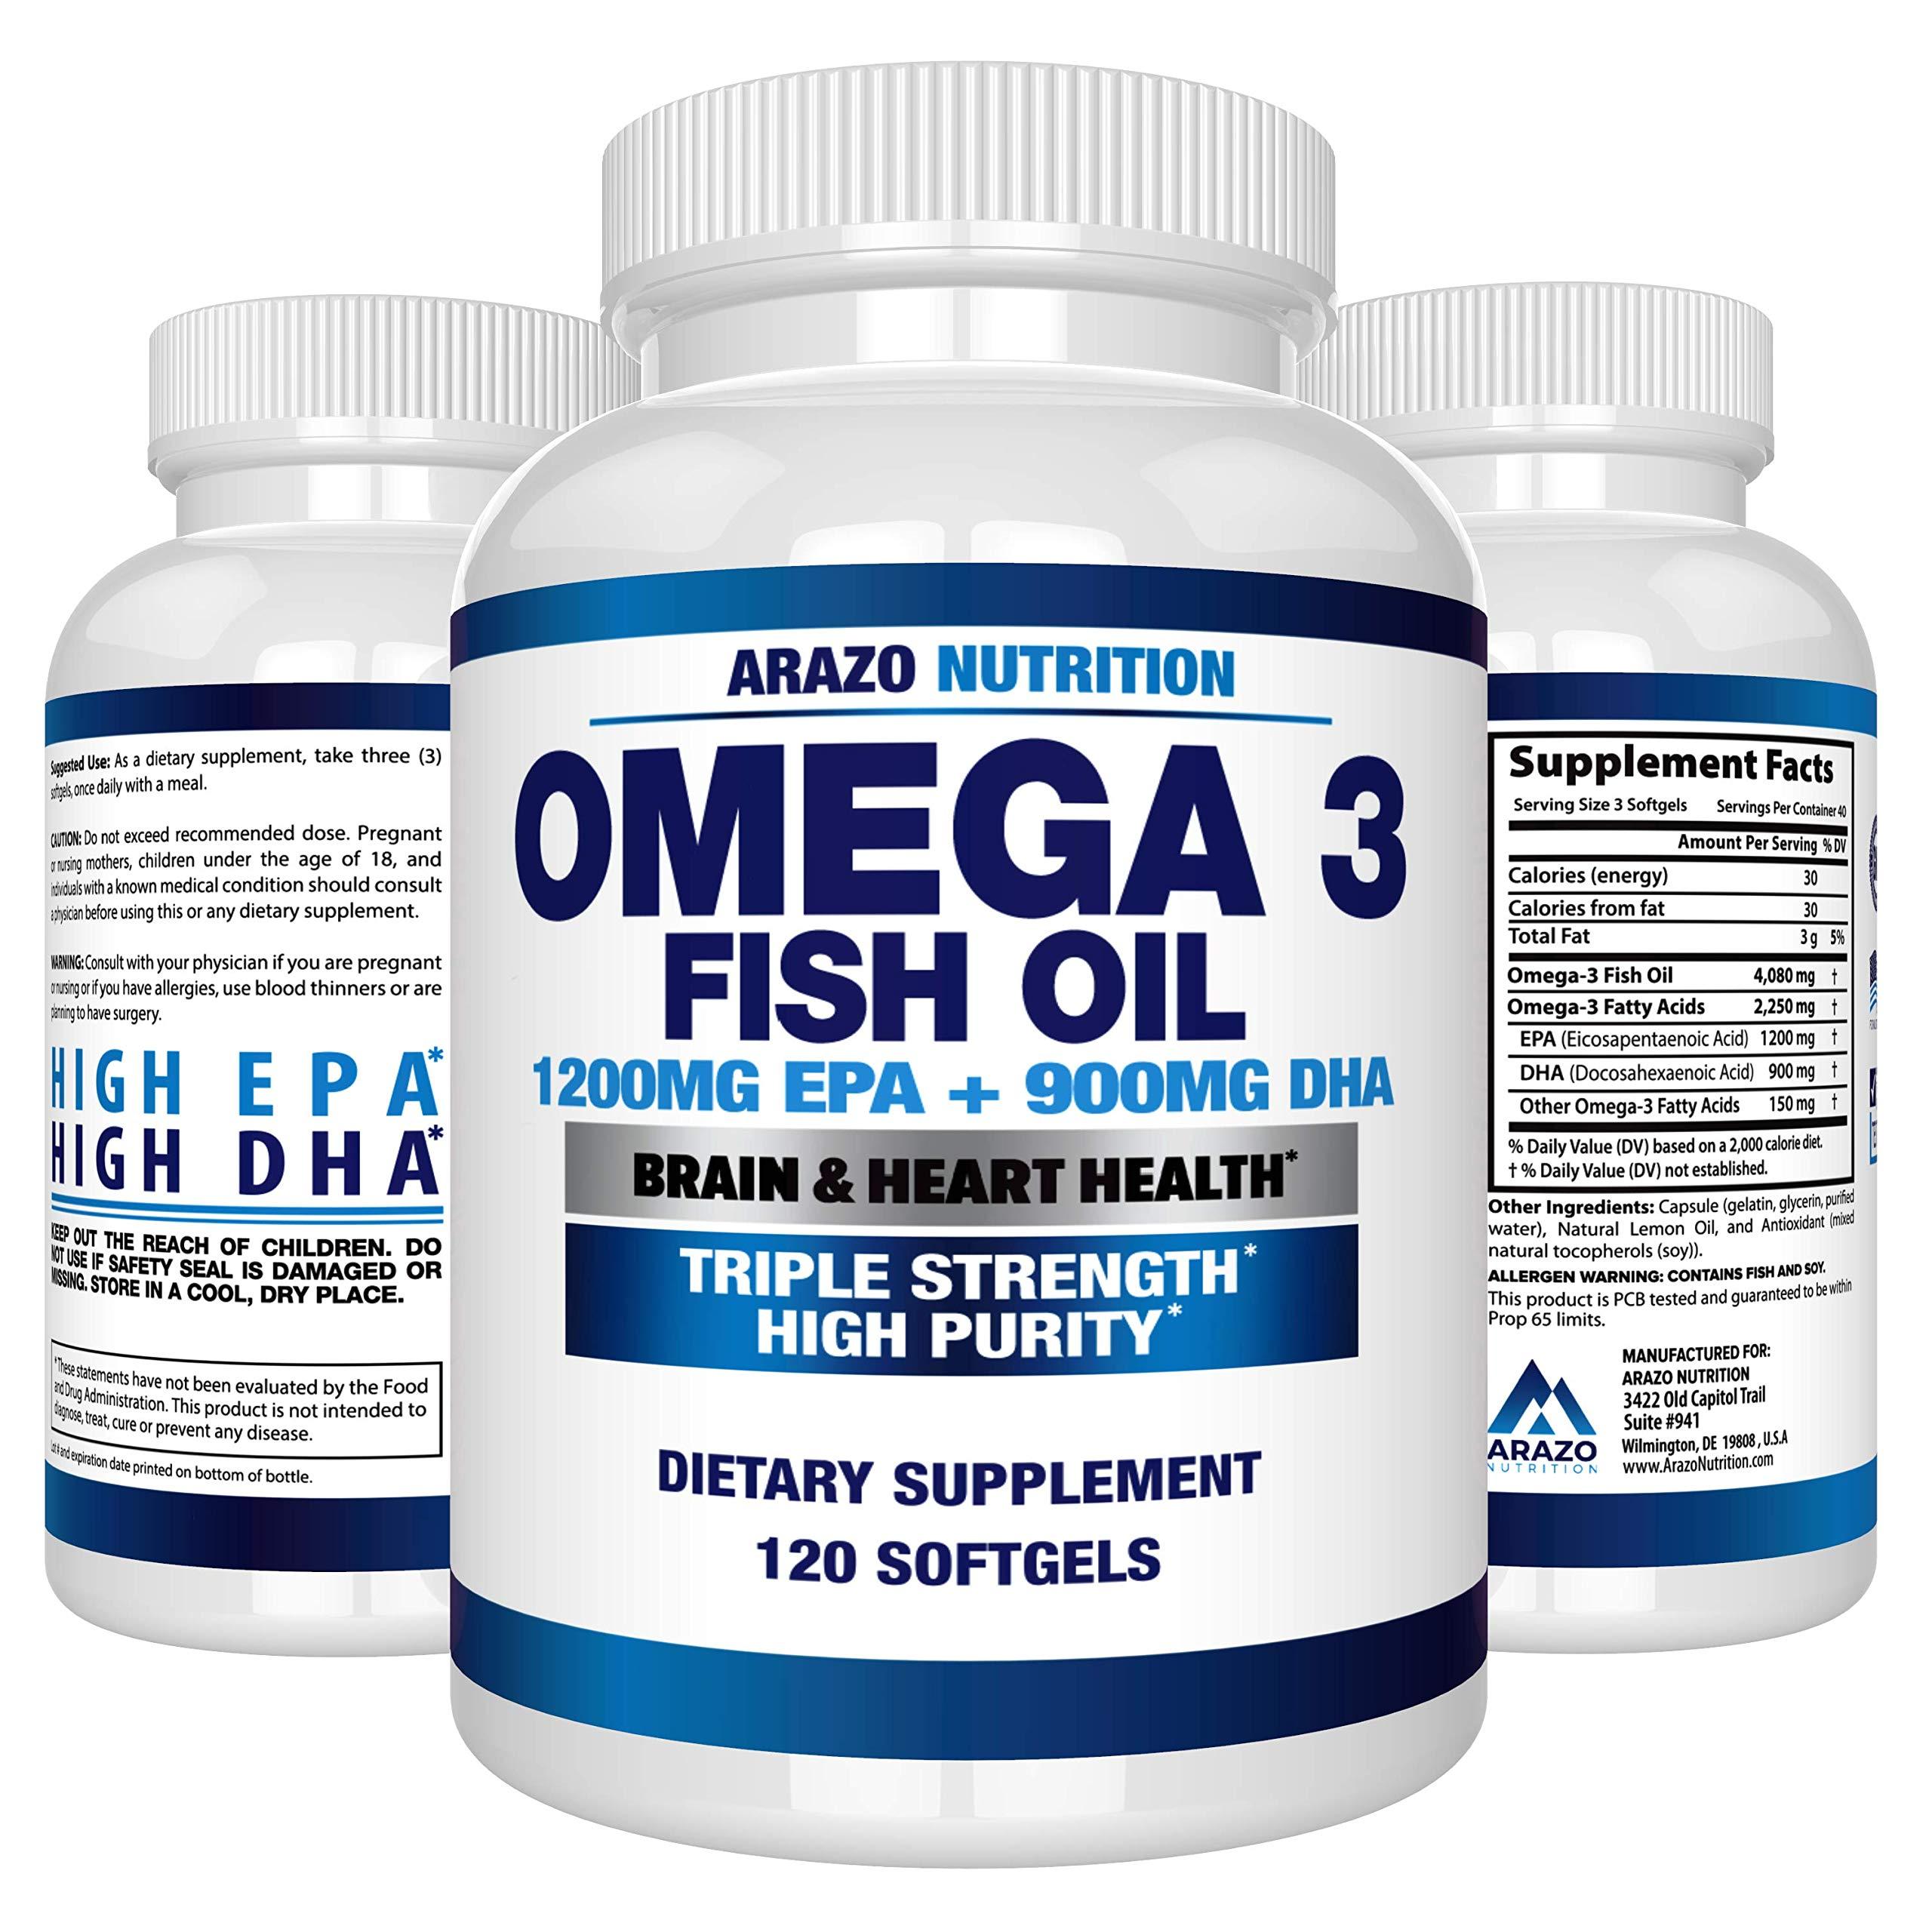 Omega 3 Fish Oil 2250mg | HIGH EPA 1200MG + DHA 900MG Triple Strength Burpless Capsules | Arazo Nutrition (120 Count)